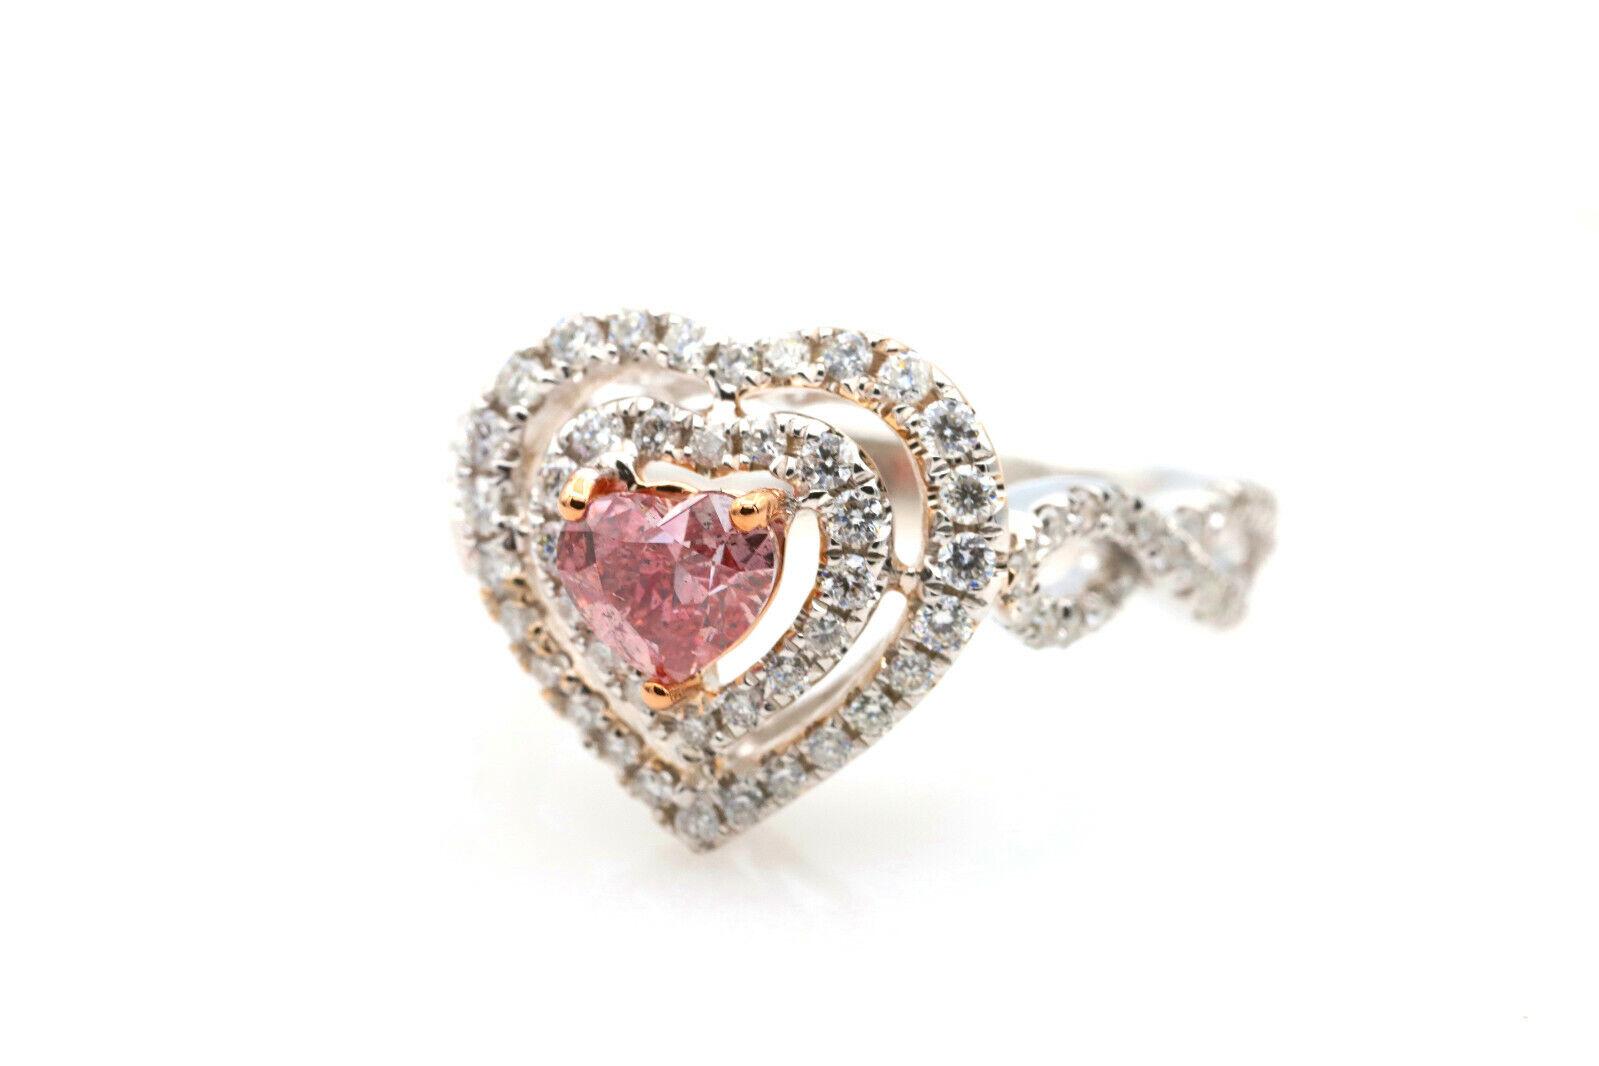 Argyle 1.07ct Natural Fancy Deep Pink Diamond Engagement Ring GIA 18K White Gold 1